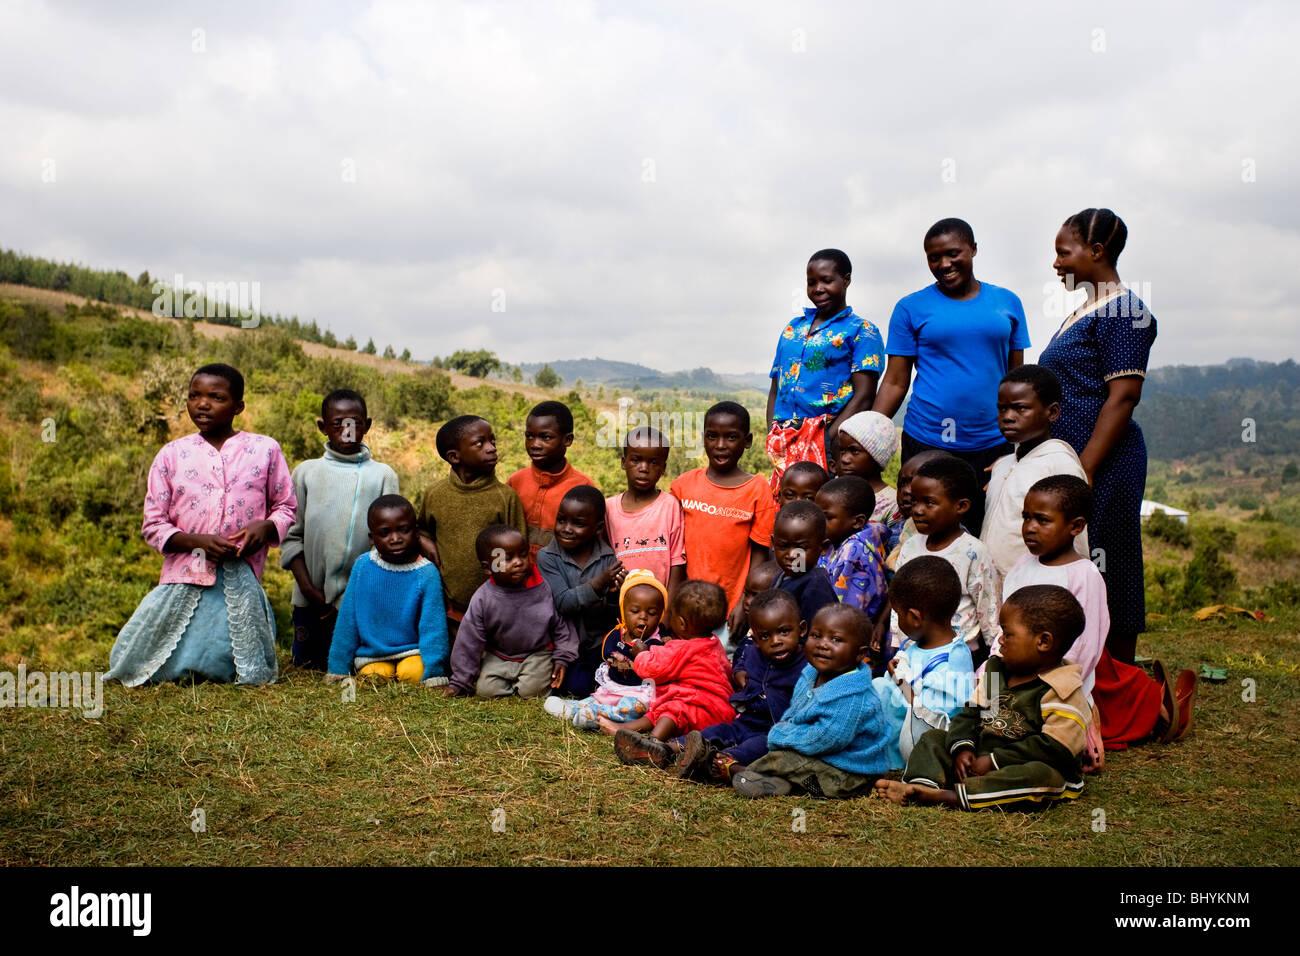 Bambini locali a Mufindi, Tanzania Africa orientale Immagini Stock